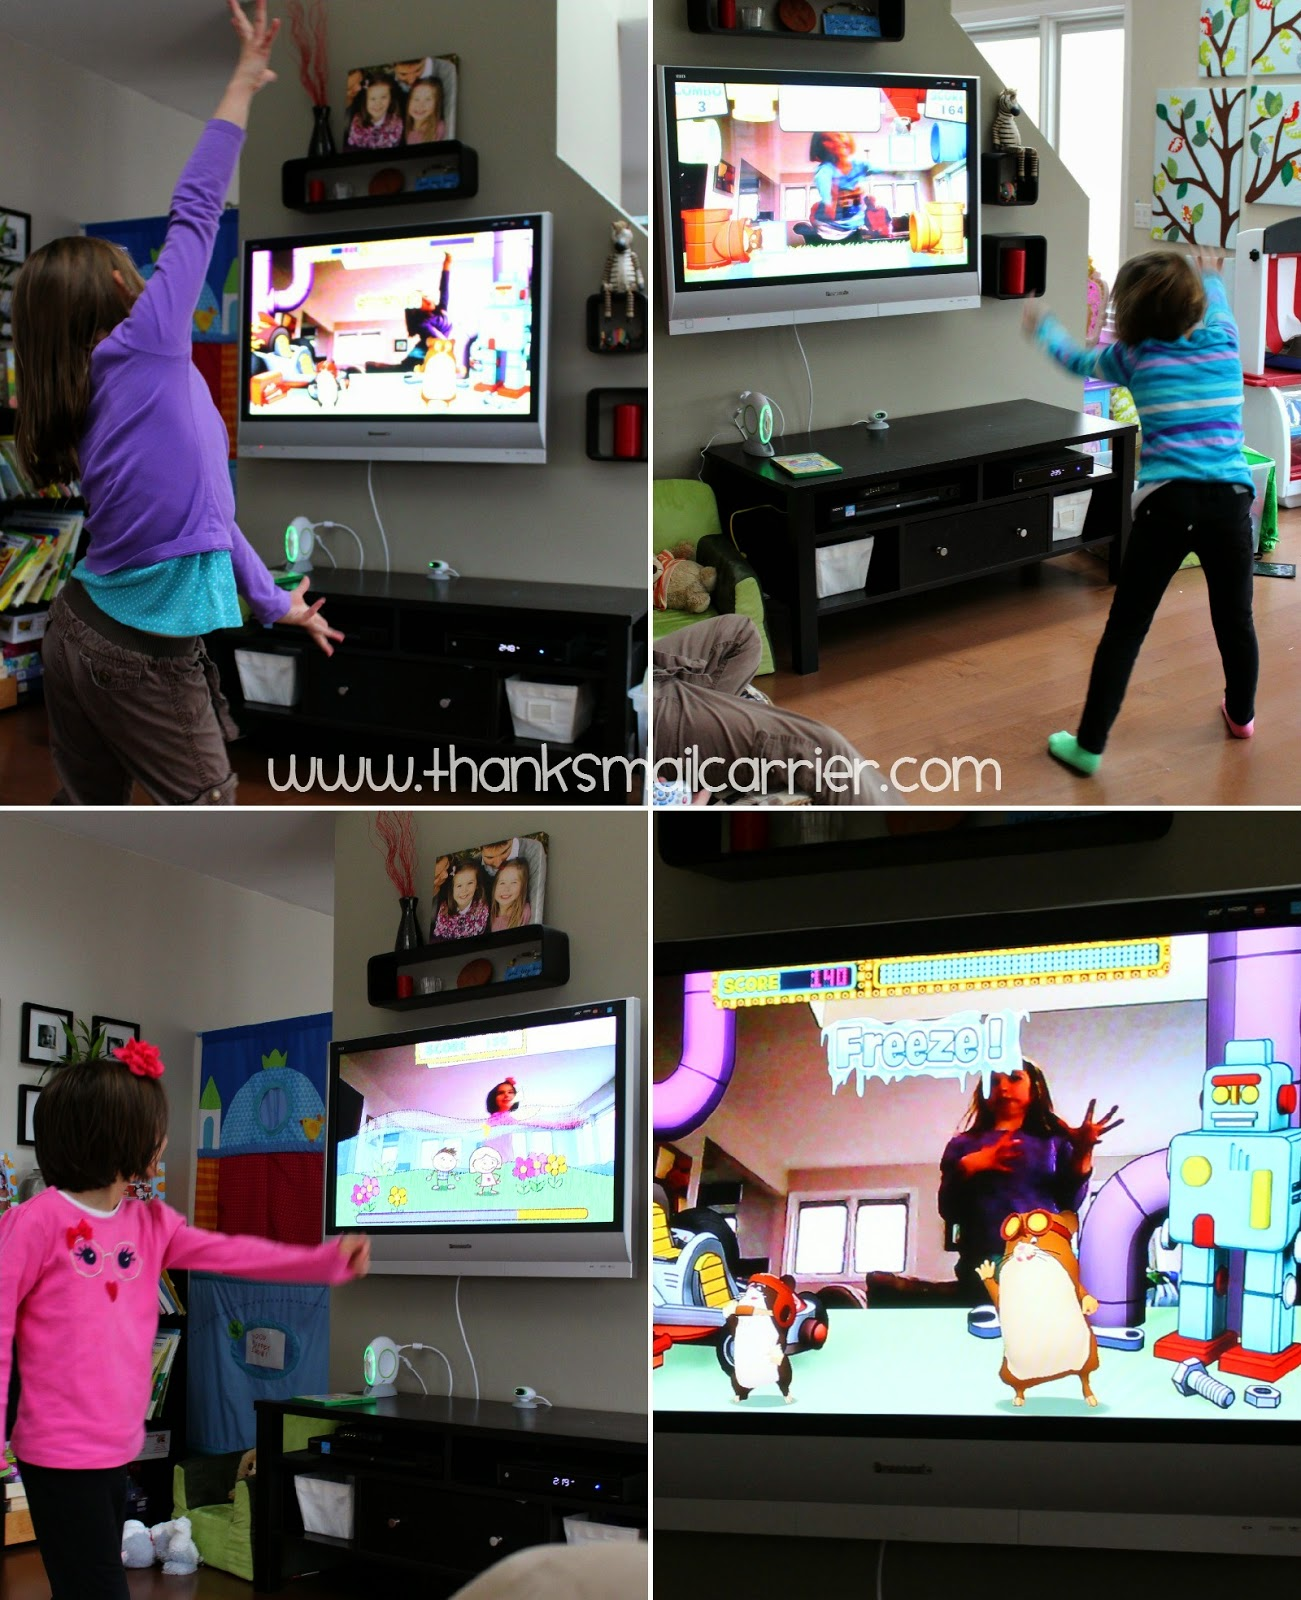 LeapTV Dance & Learn